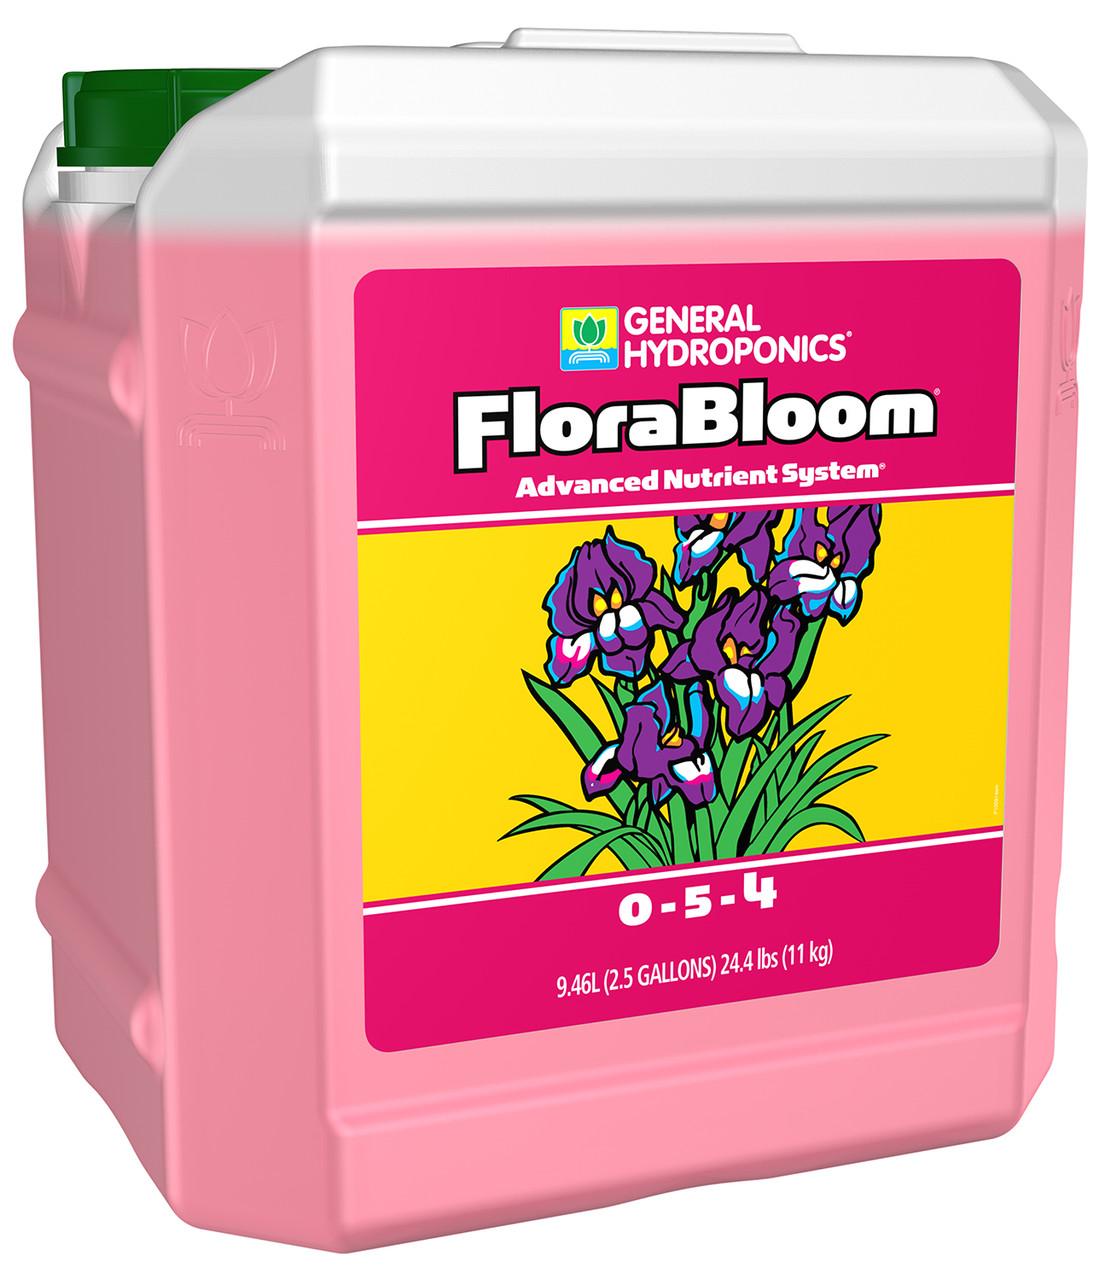 General Hydroponics® FloraBloom® 0 - 5 - 4  2.5Gallon